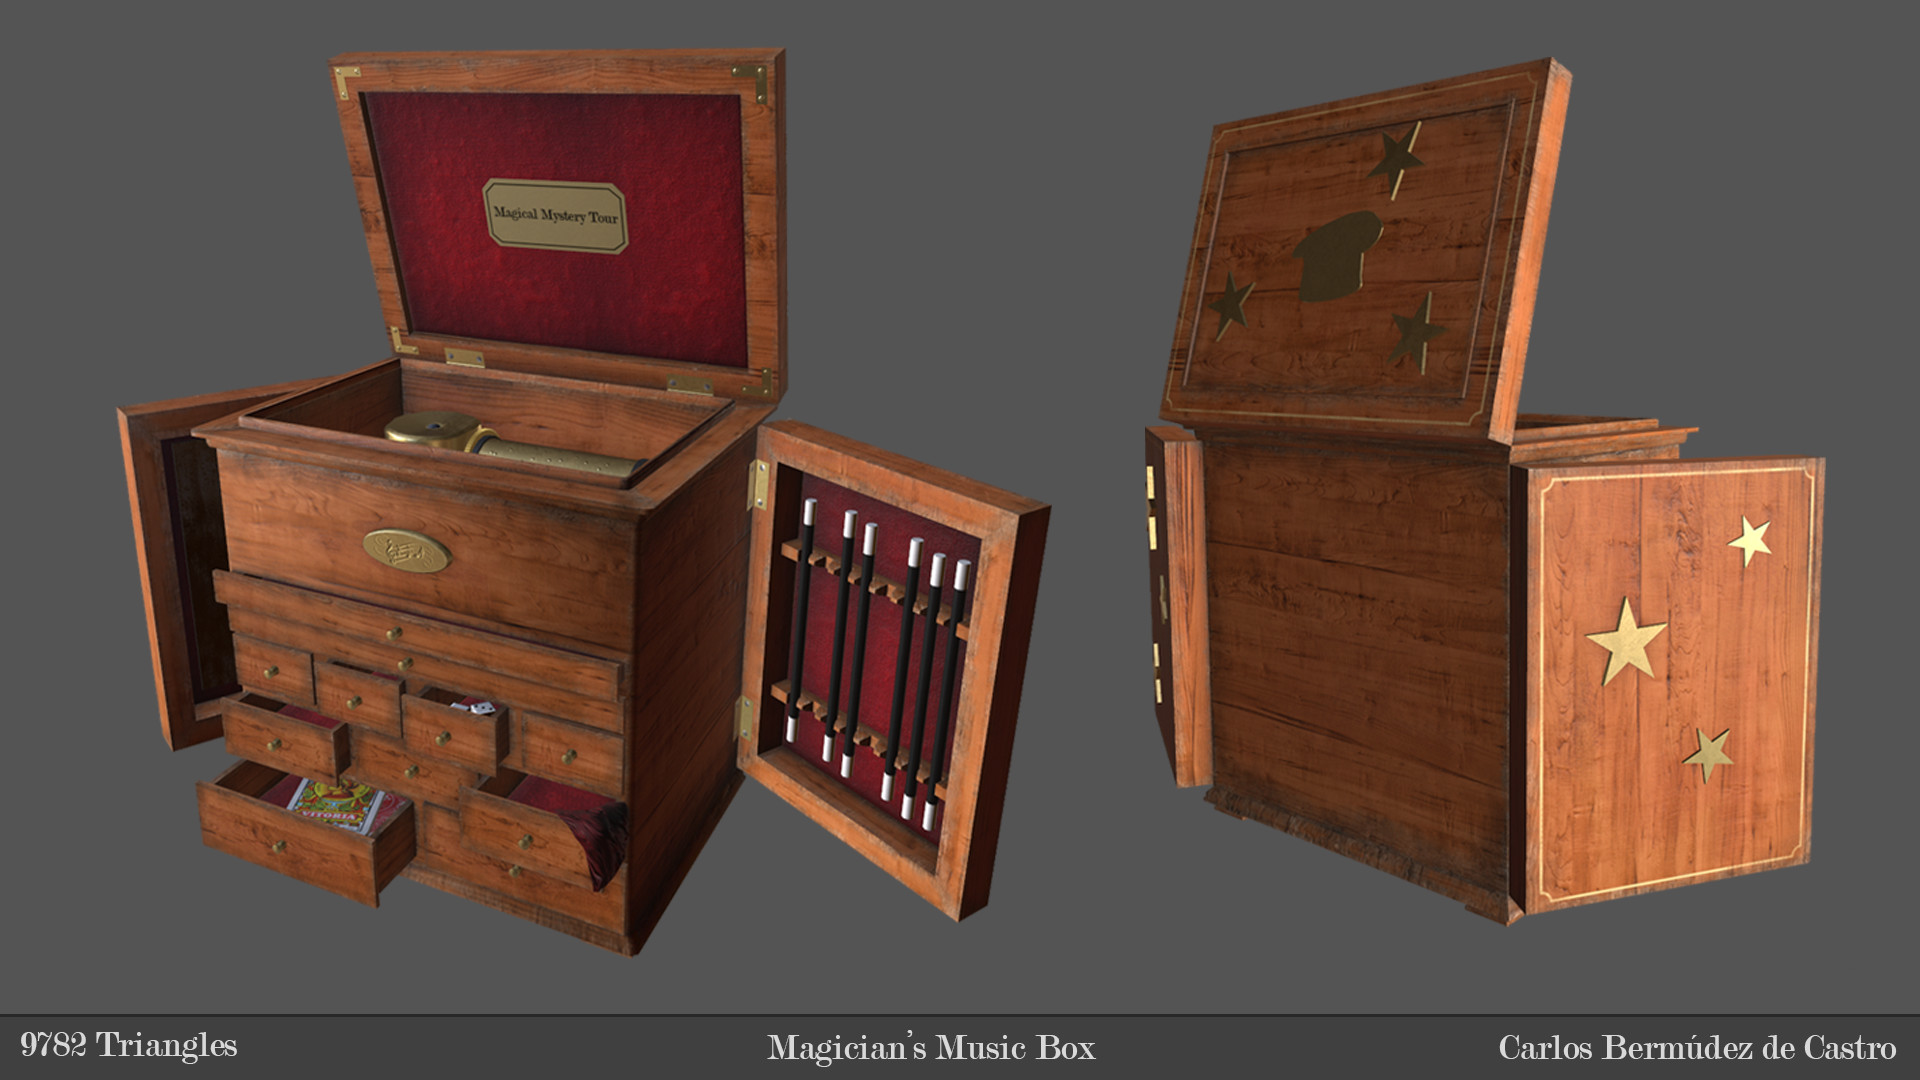 Artstation Magician S Music Box Carlos Berm Dez De Castro Muela # Muebles Heve Castro